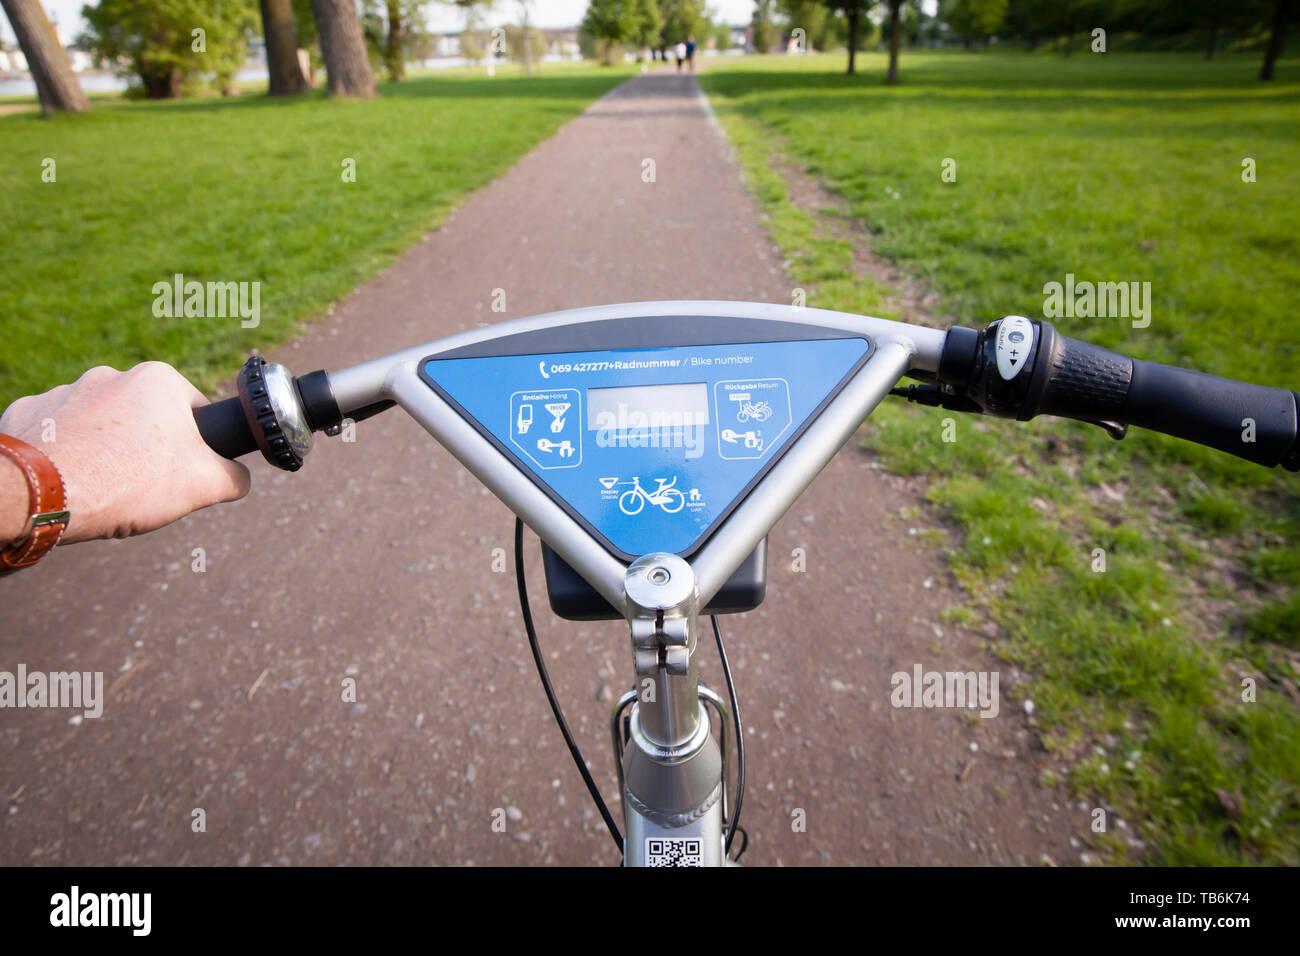 riding a rental bicycle, Ford-Pass-Bike, DB Call a Bike, Cologne, Germany.  Fahrt auf einem Mietfahrrad, Fordpass-Bike, DB Call a Bike, Koeln, Deutsch Stock Photo